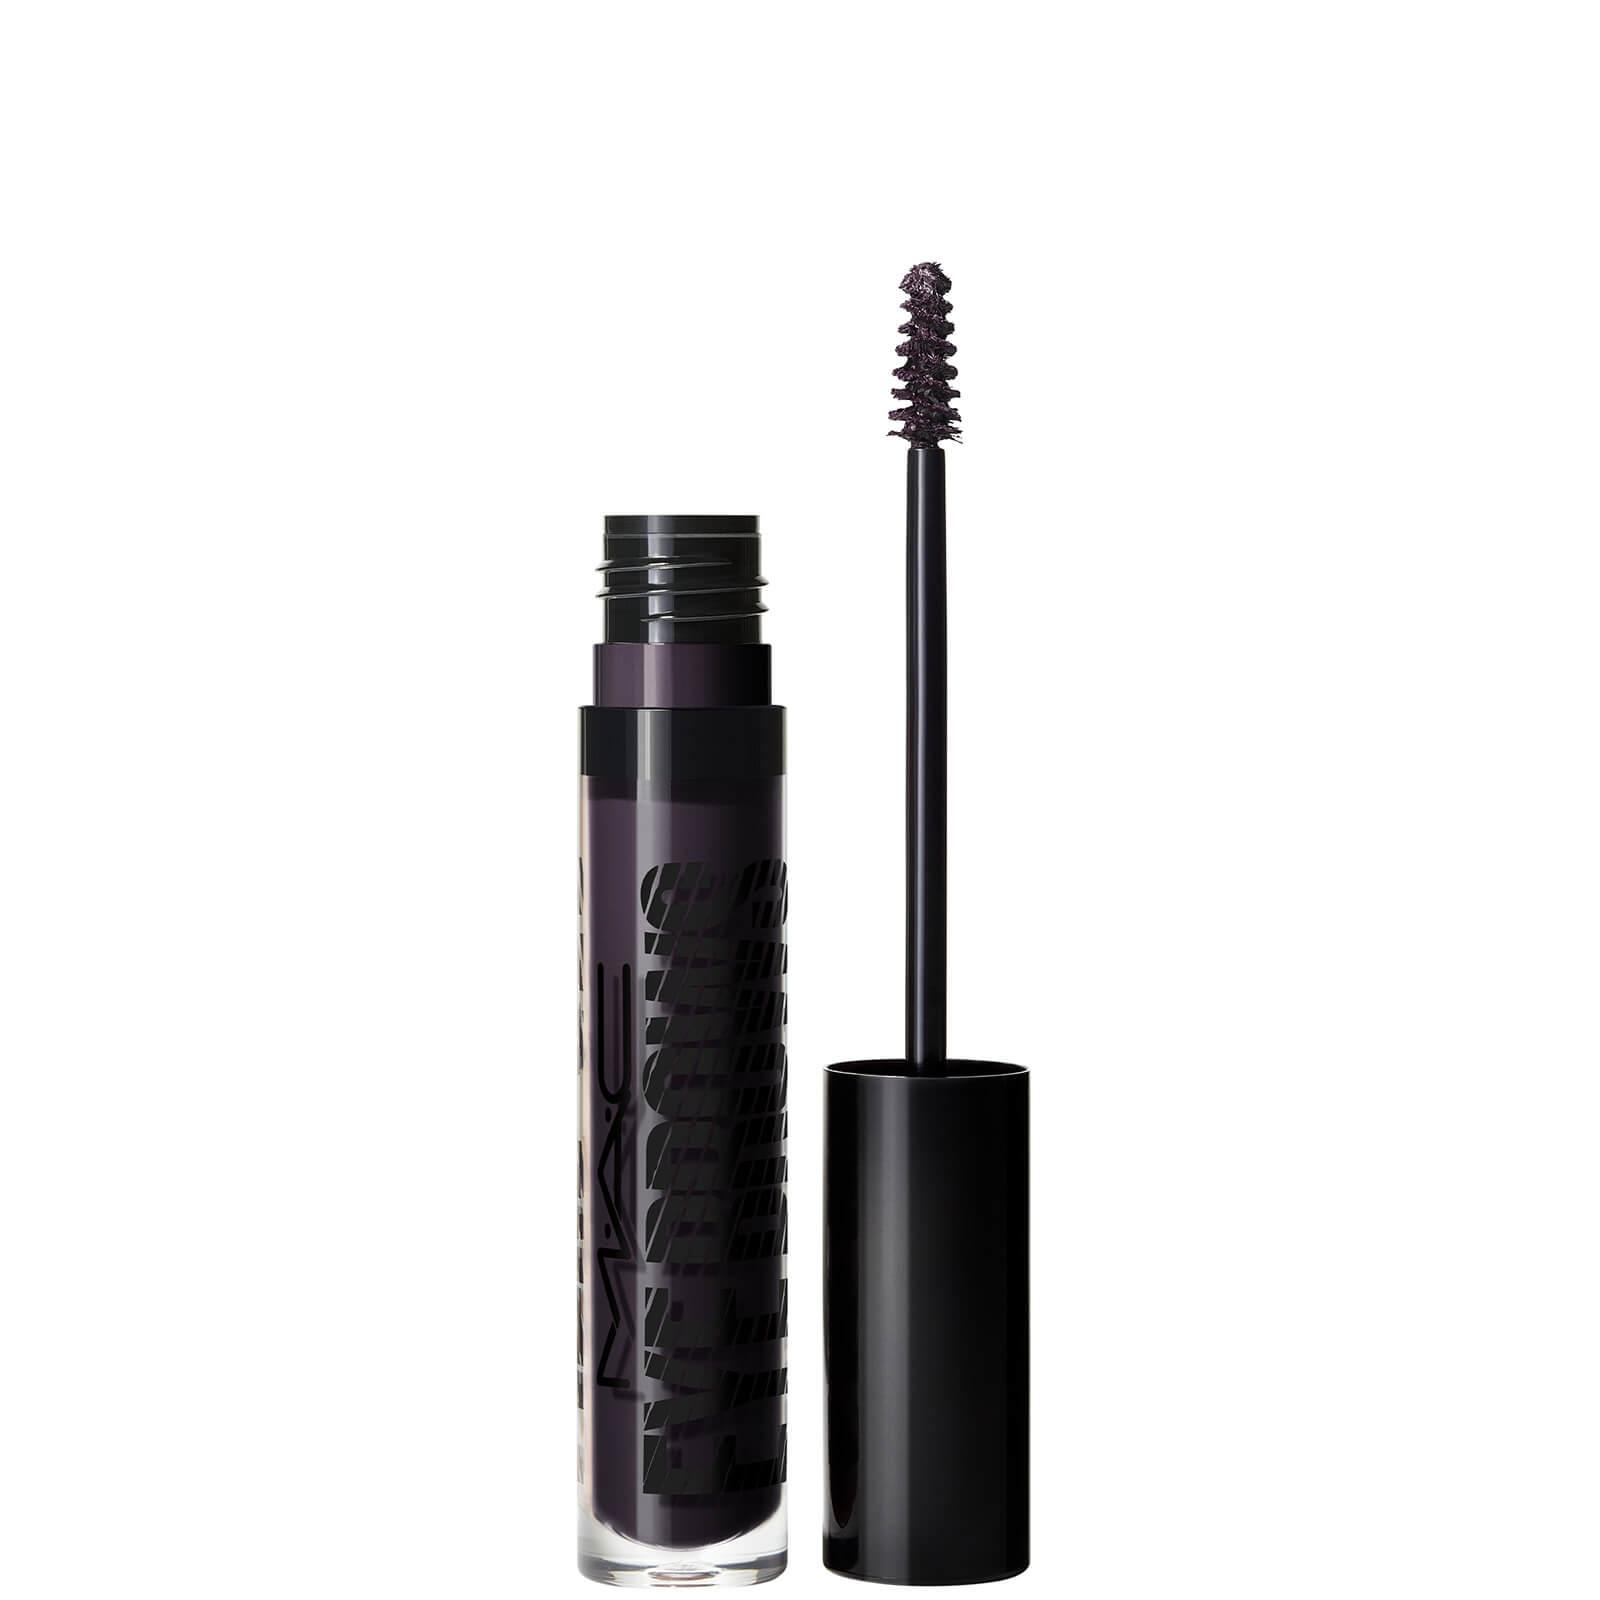 MAC Eyebrow Big Boost Gel 4.1g (Various Shades) - Genuine Aubergine